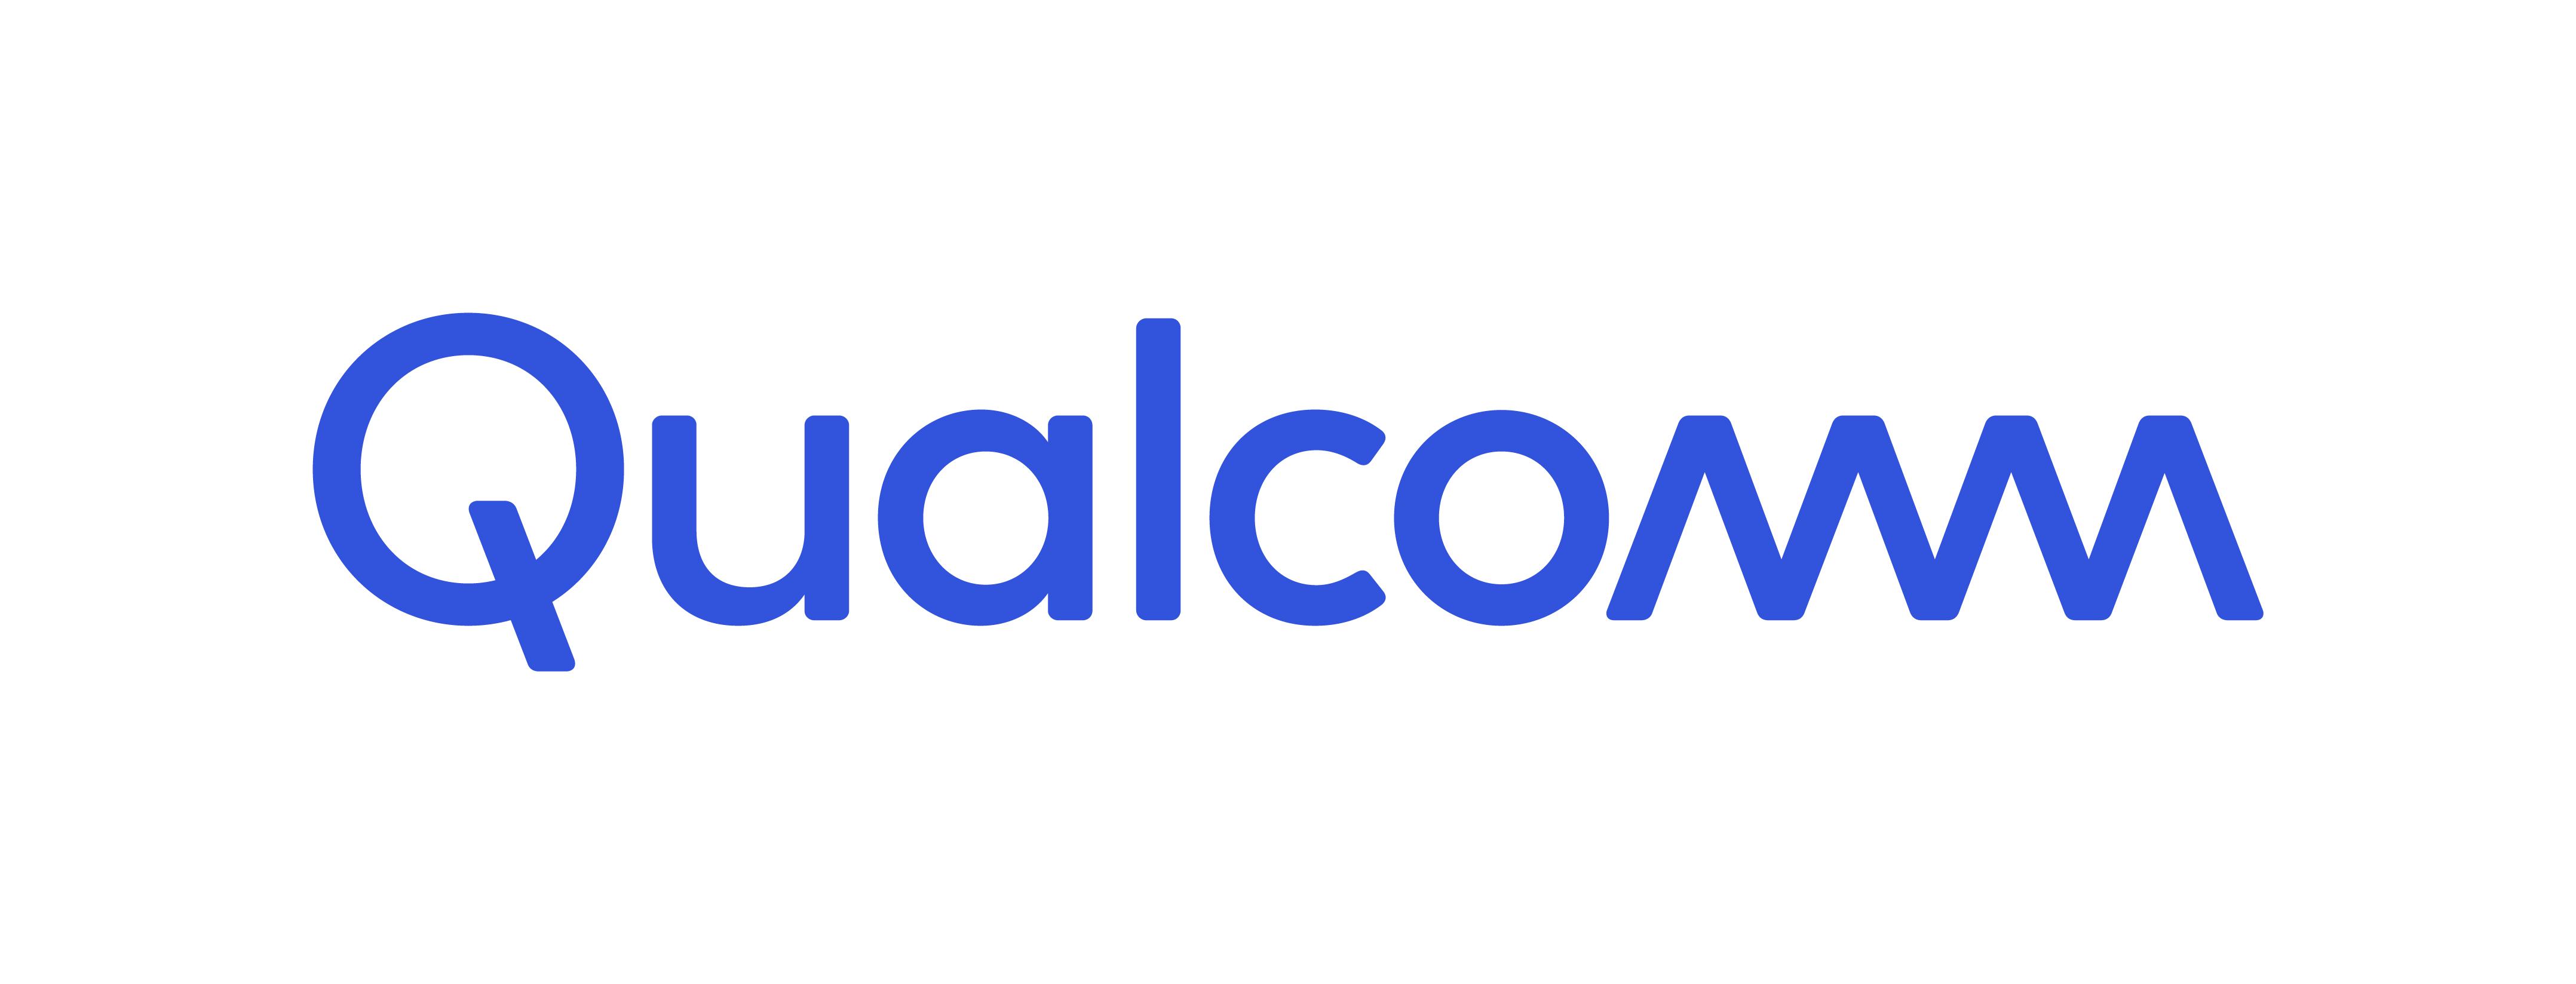 Qualcomm Technologies, Inc.  logo